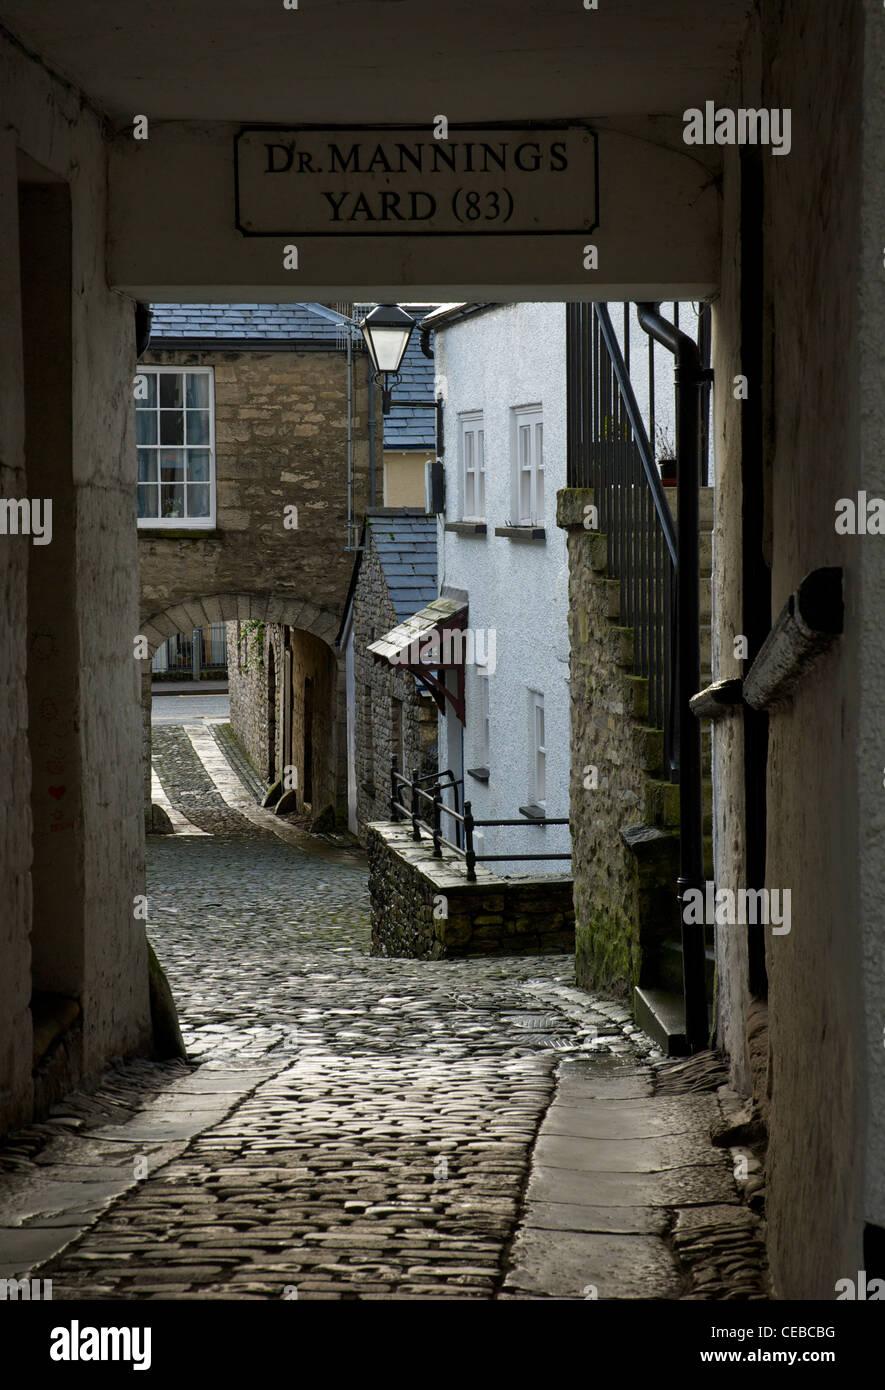 Dr Manning's Yard, Kendal Cumbria, England UK - Stock Image